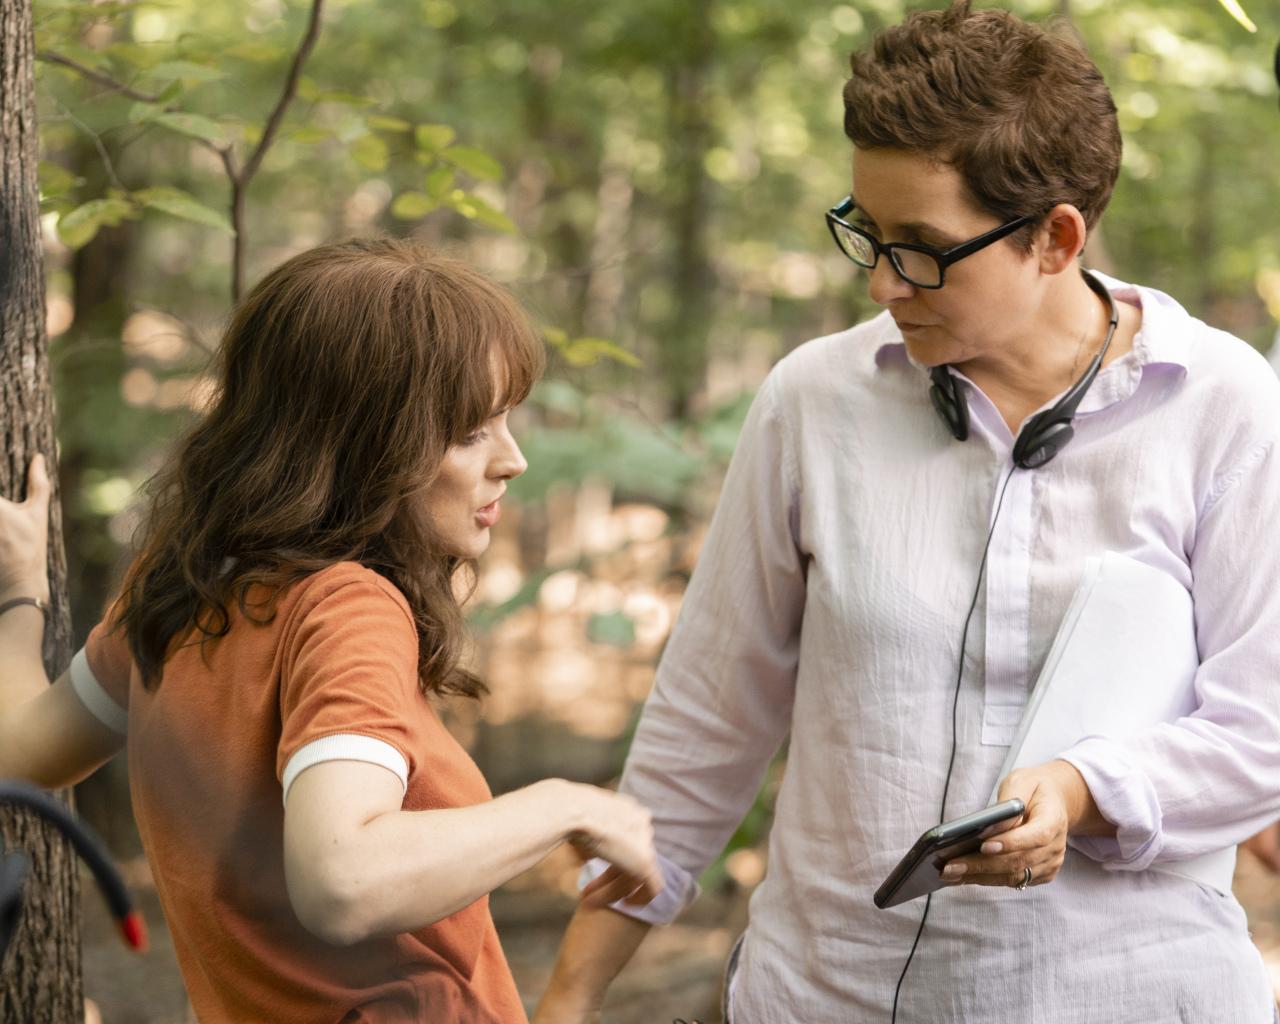 Stranger Things 3 - Behind the Scenes - Winona Ryder and Uta Briesewitz